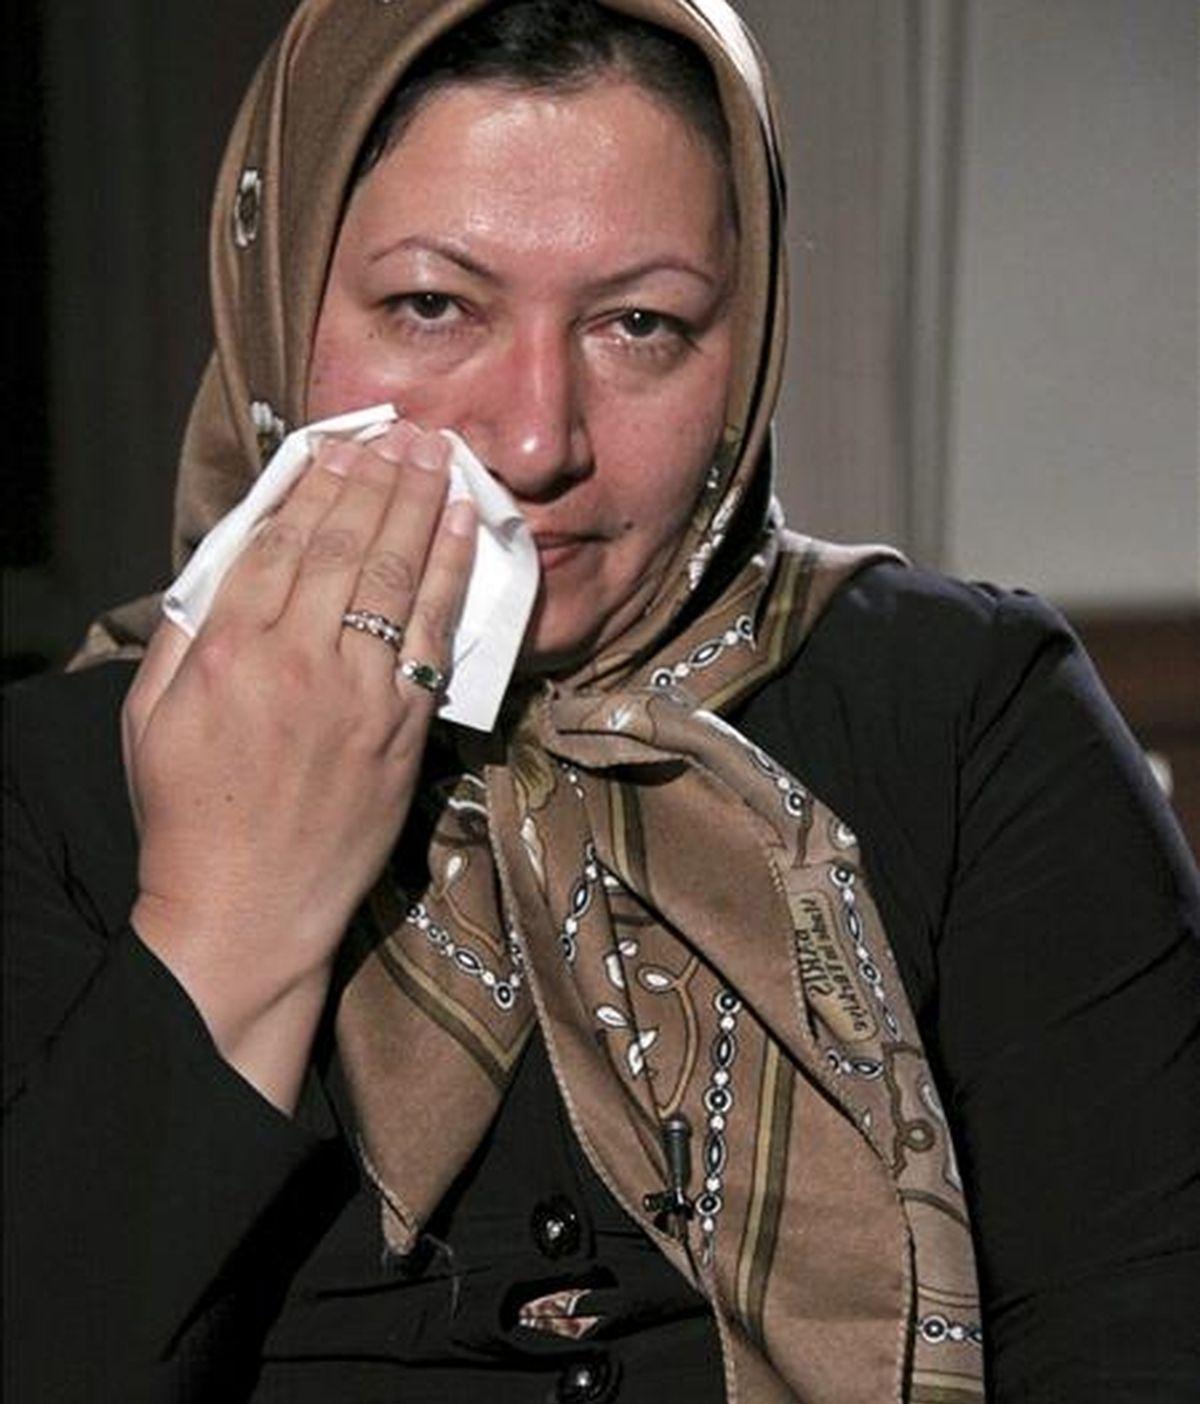 Imagen cedida por la cadena iraní Press TV el 9 de diciembre de 2010 de Sakineh Mohammadi Ashtiani. EFE